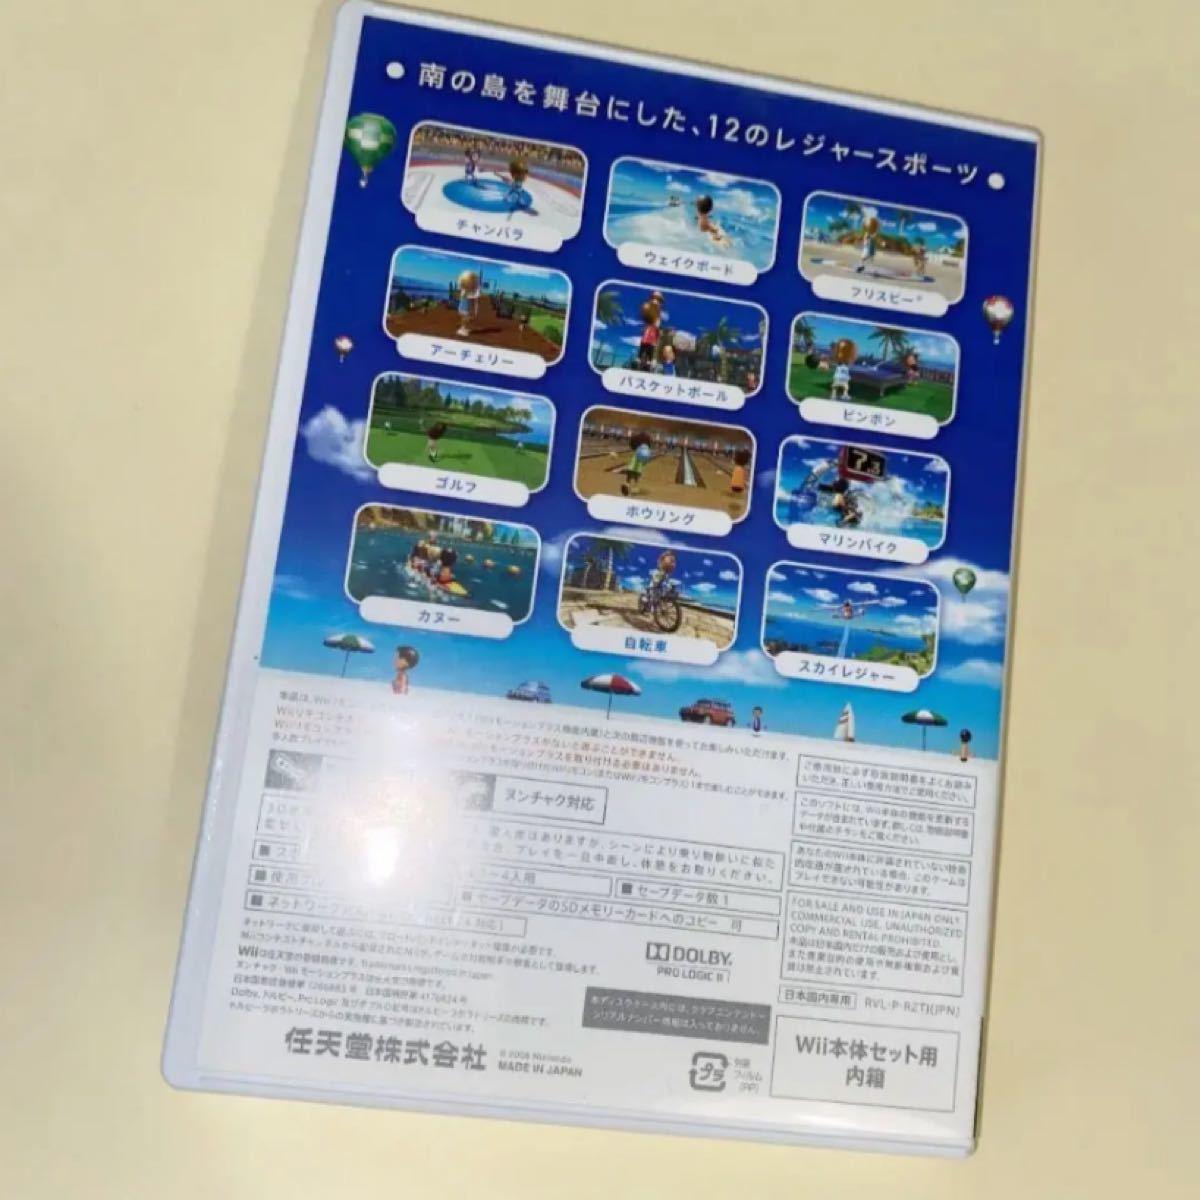 【Wii】スポーツリゾートゲームソフト/送料込